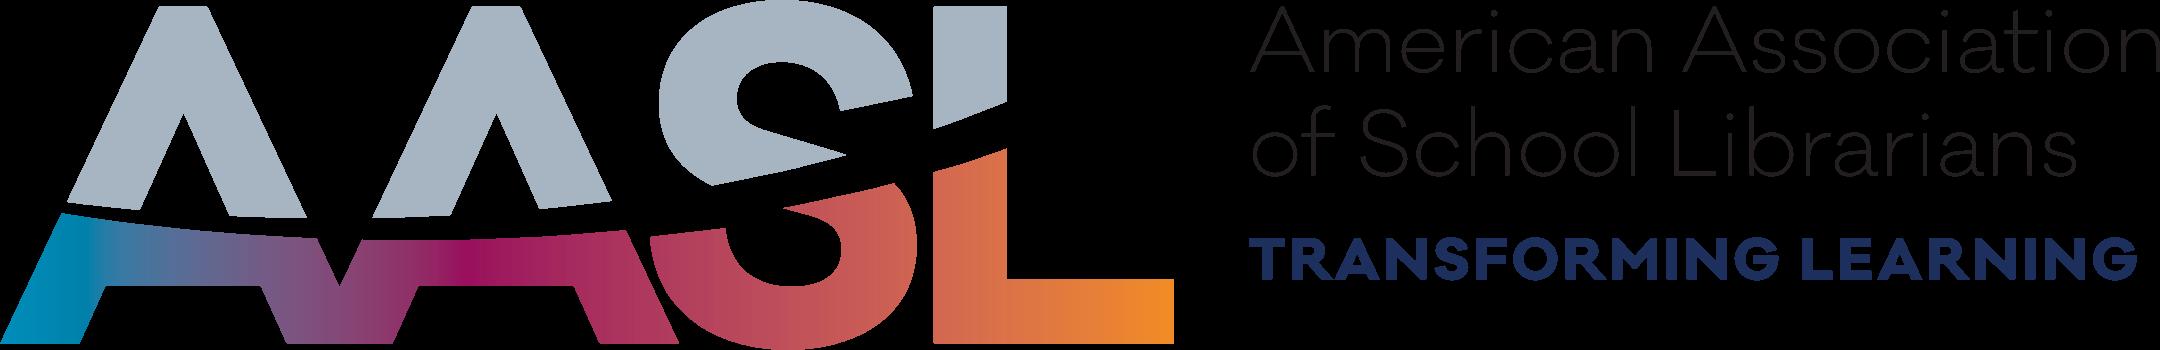 AASL American Association of School Librarians